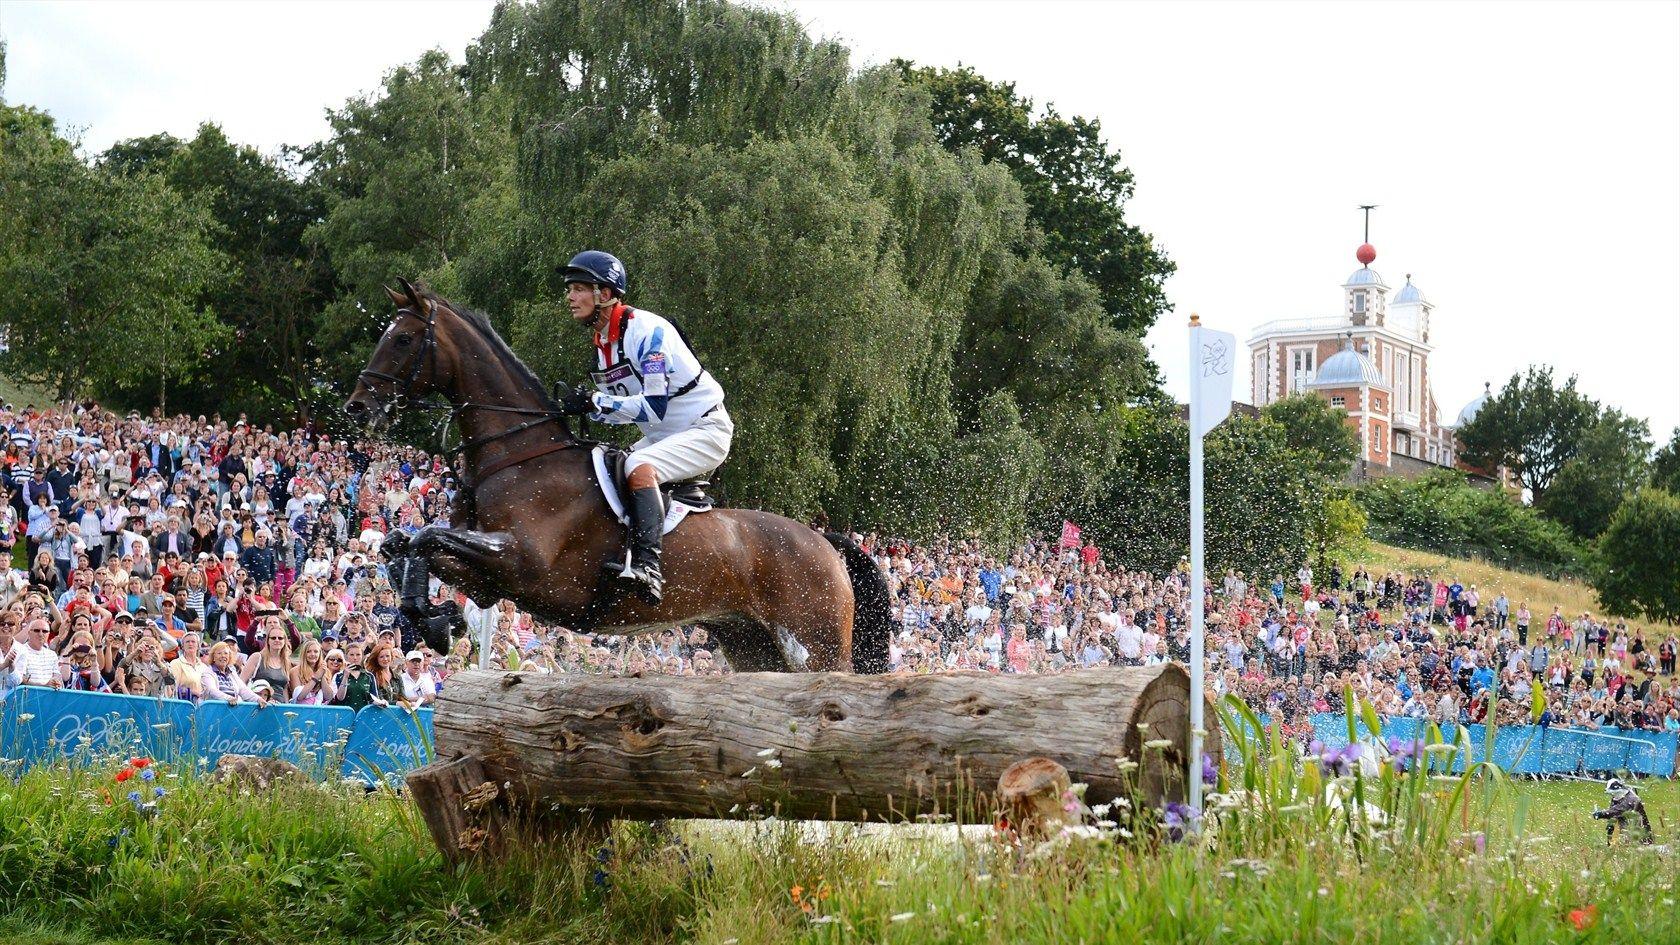 William FoxPitt of Great Britain riding Lionheart jumps